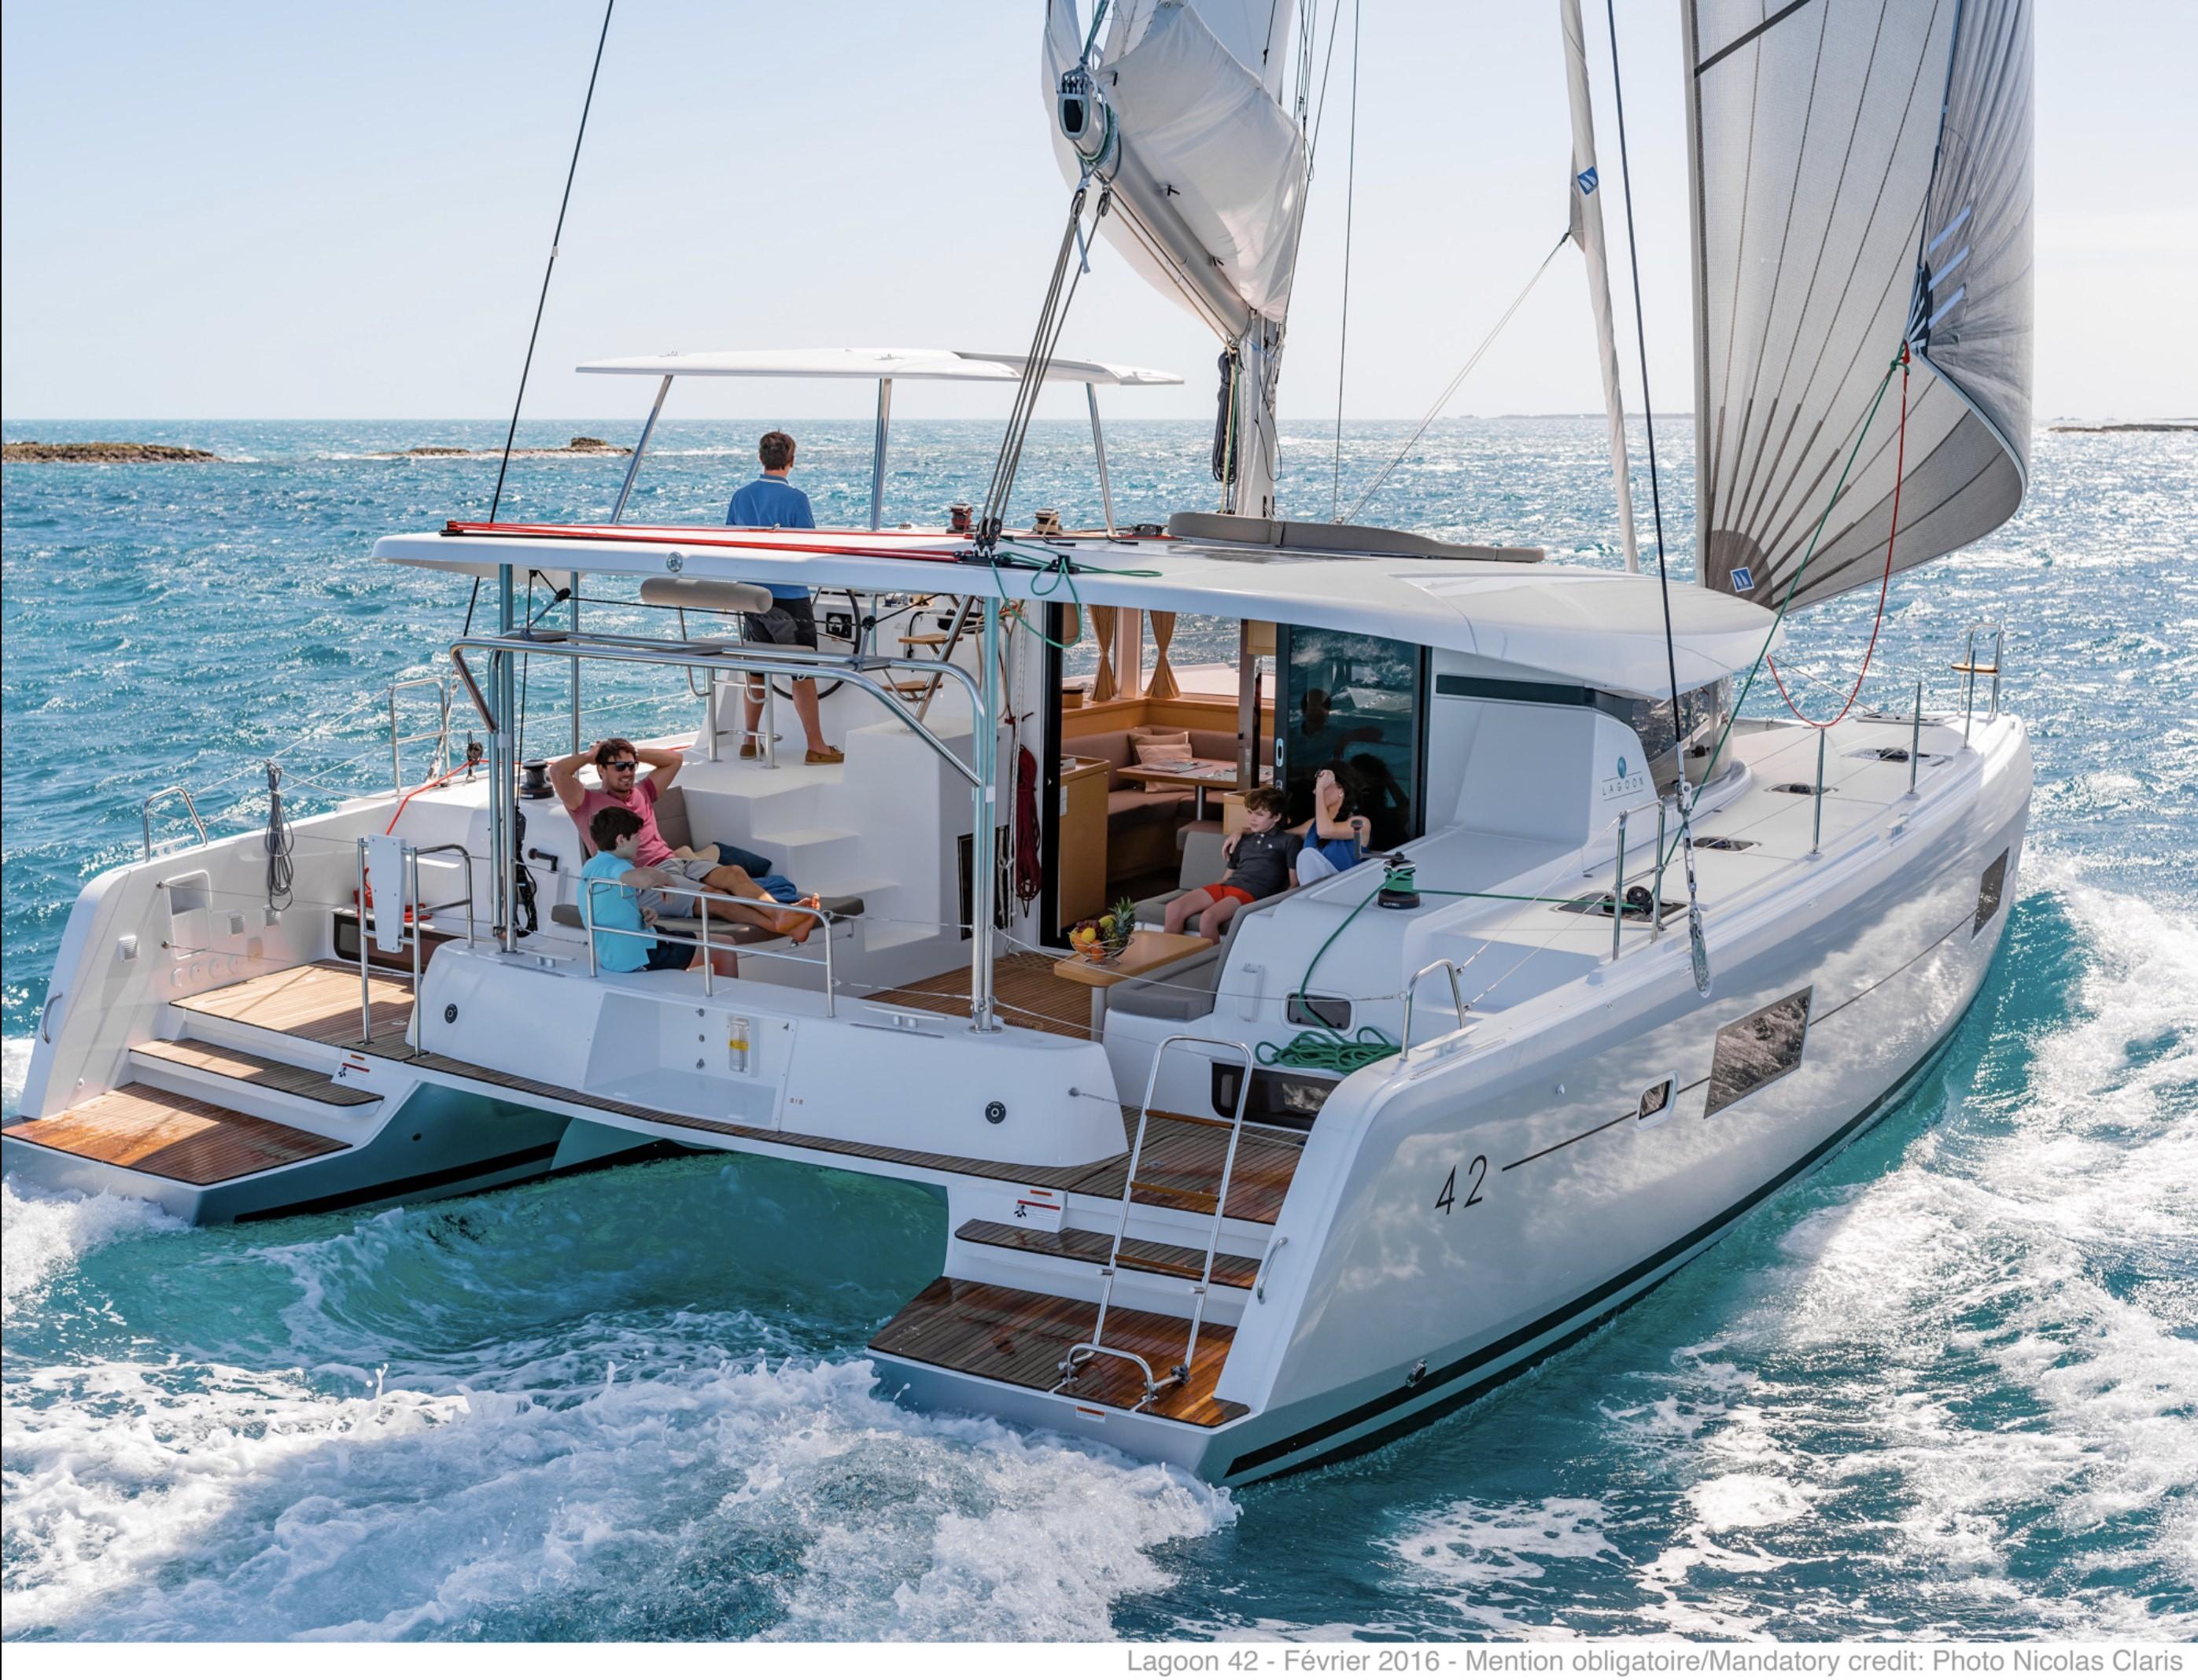 Catamaran charter Croatia - Kornati Islands, Southern